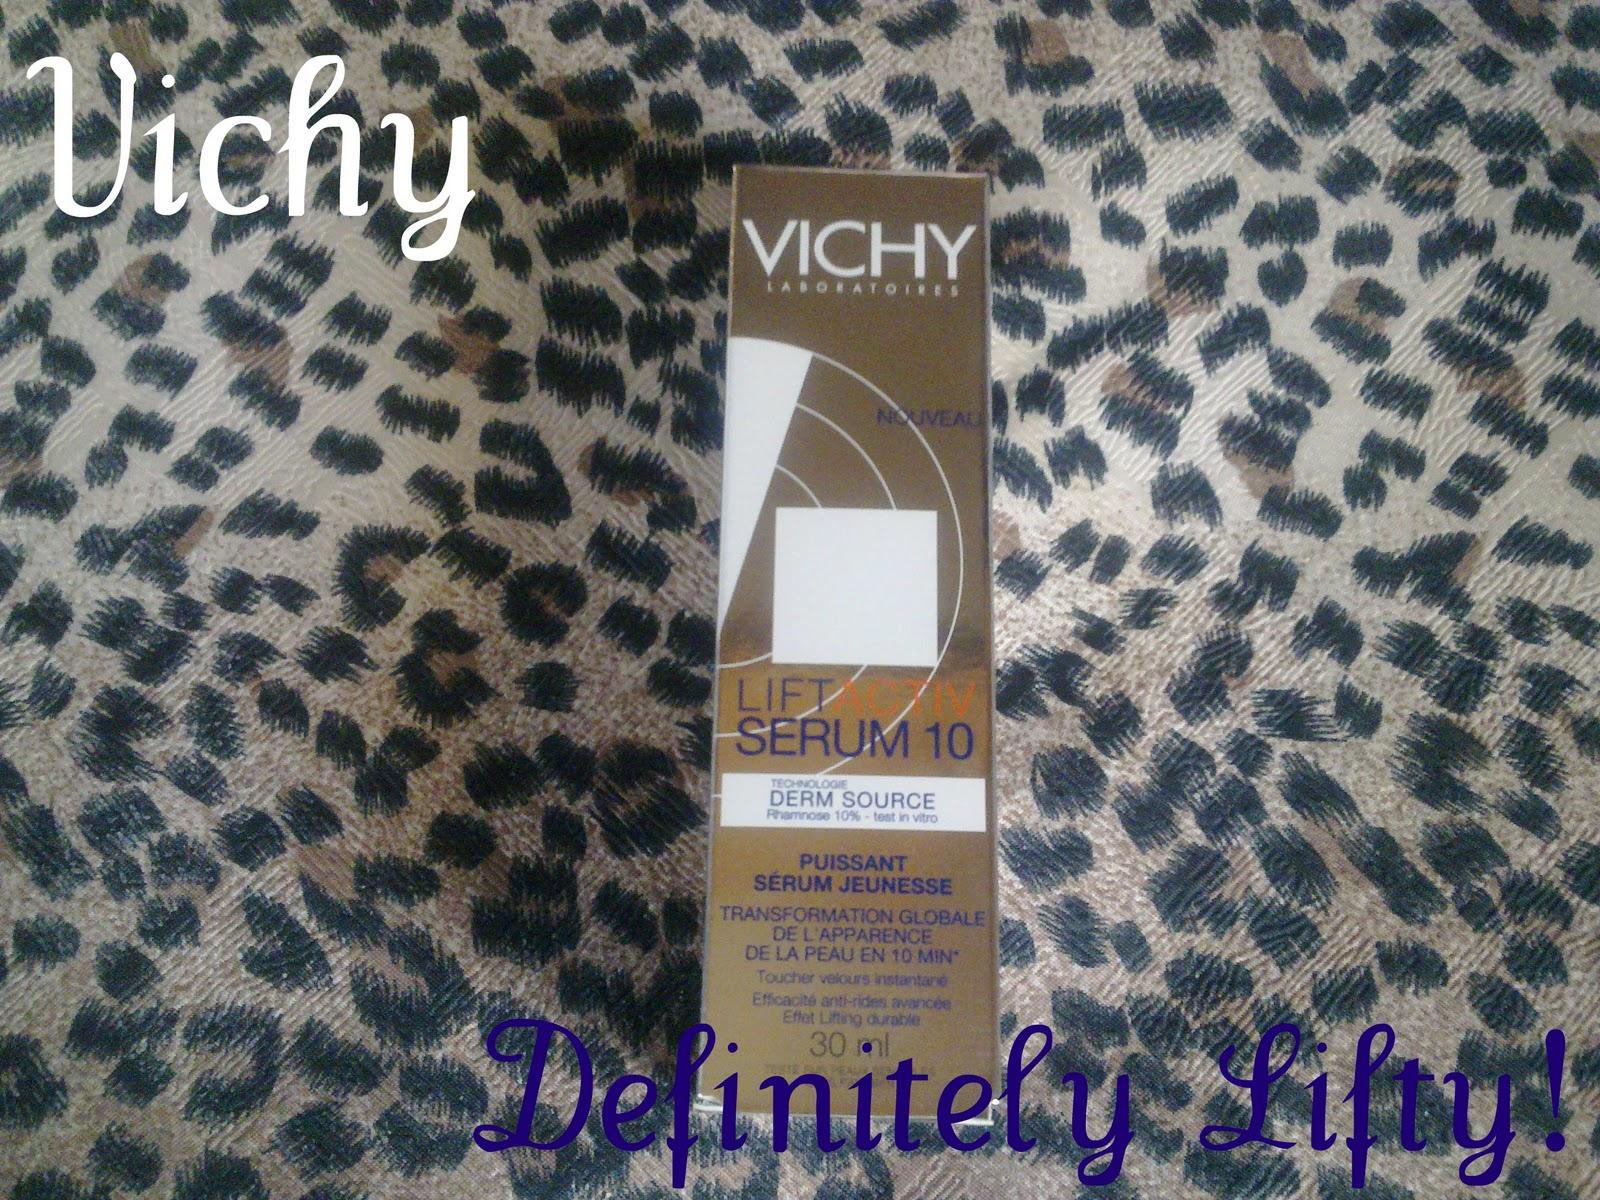 CherrySue, Doin' the Do: Vichy LiftActiv Serum 10 - It's Lifty